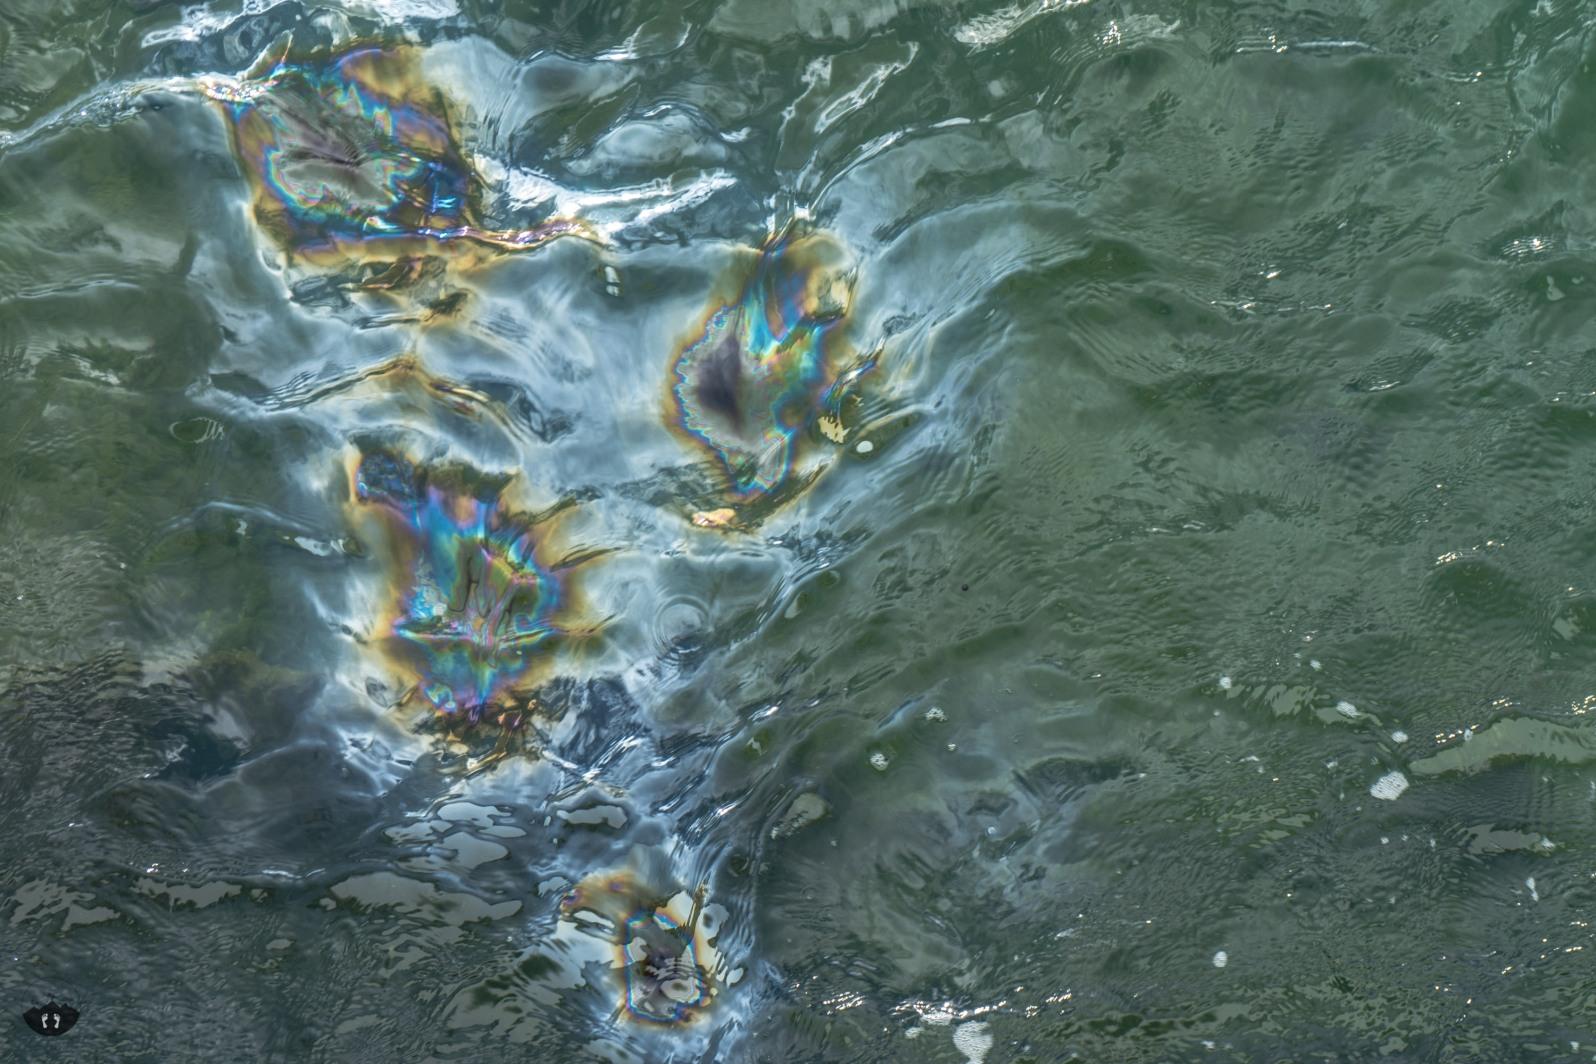 Oil Droplets of the USS Arizona